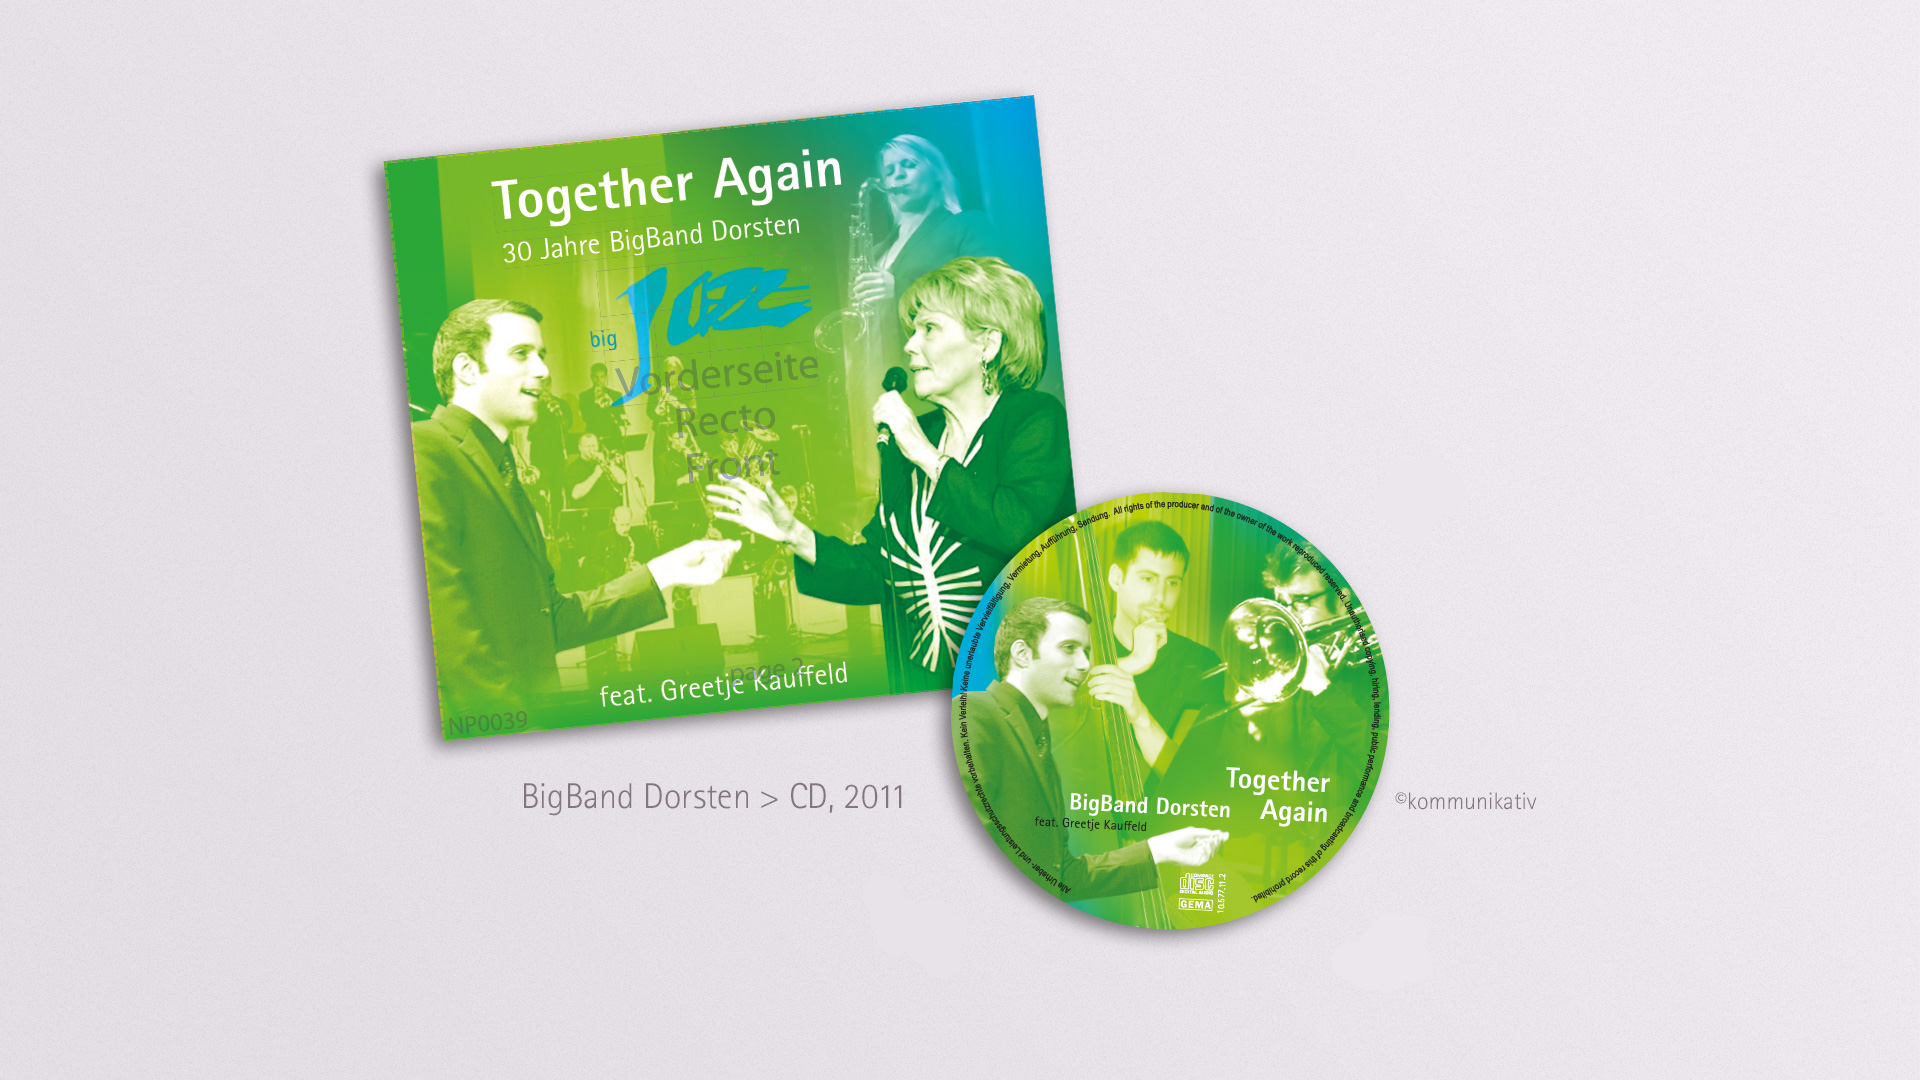 BigBand Dorsten CD 2011